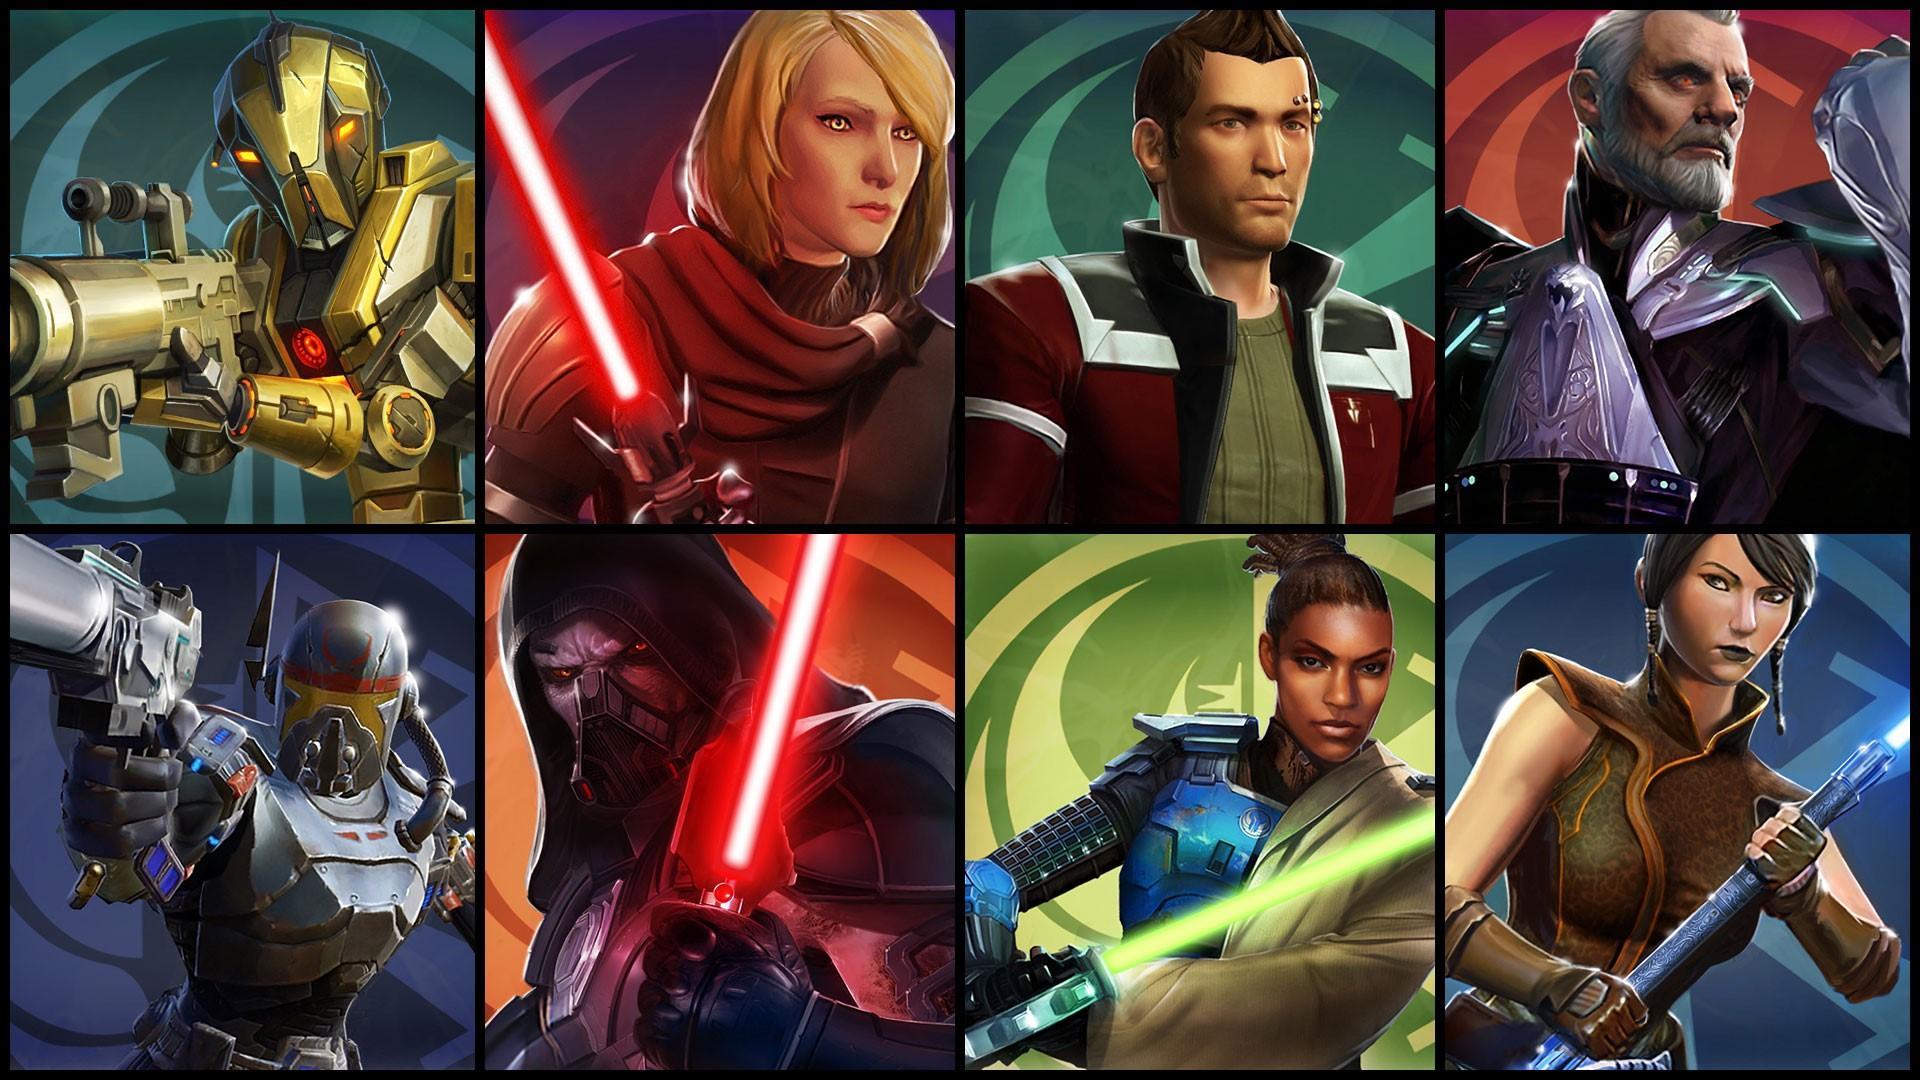 swtor heroes